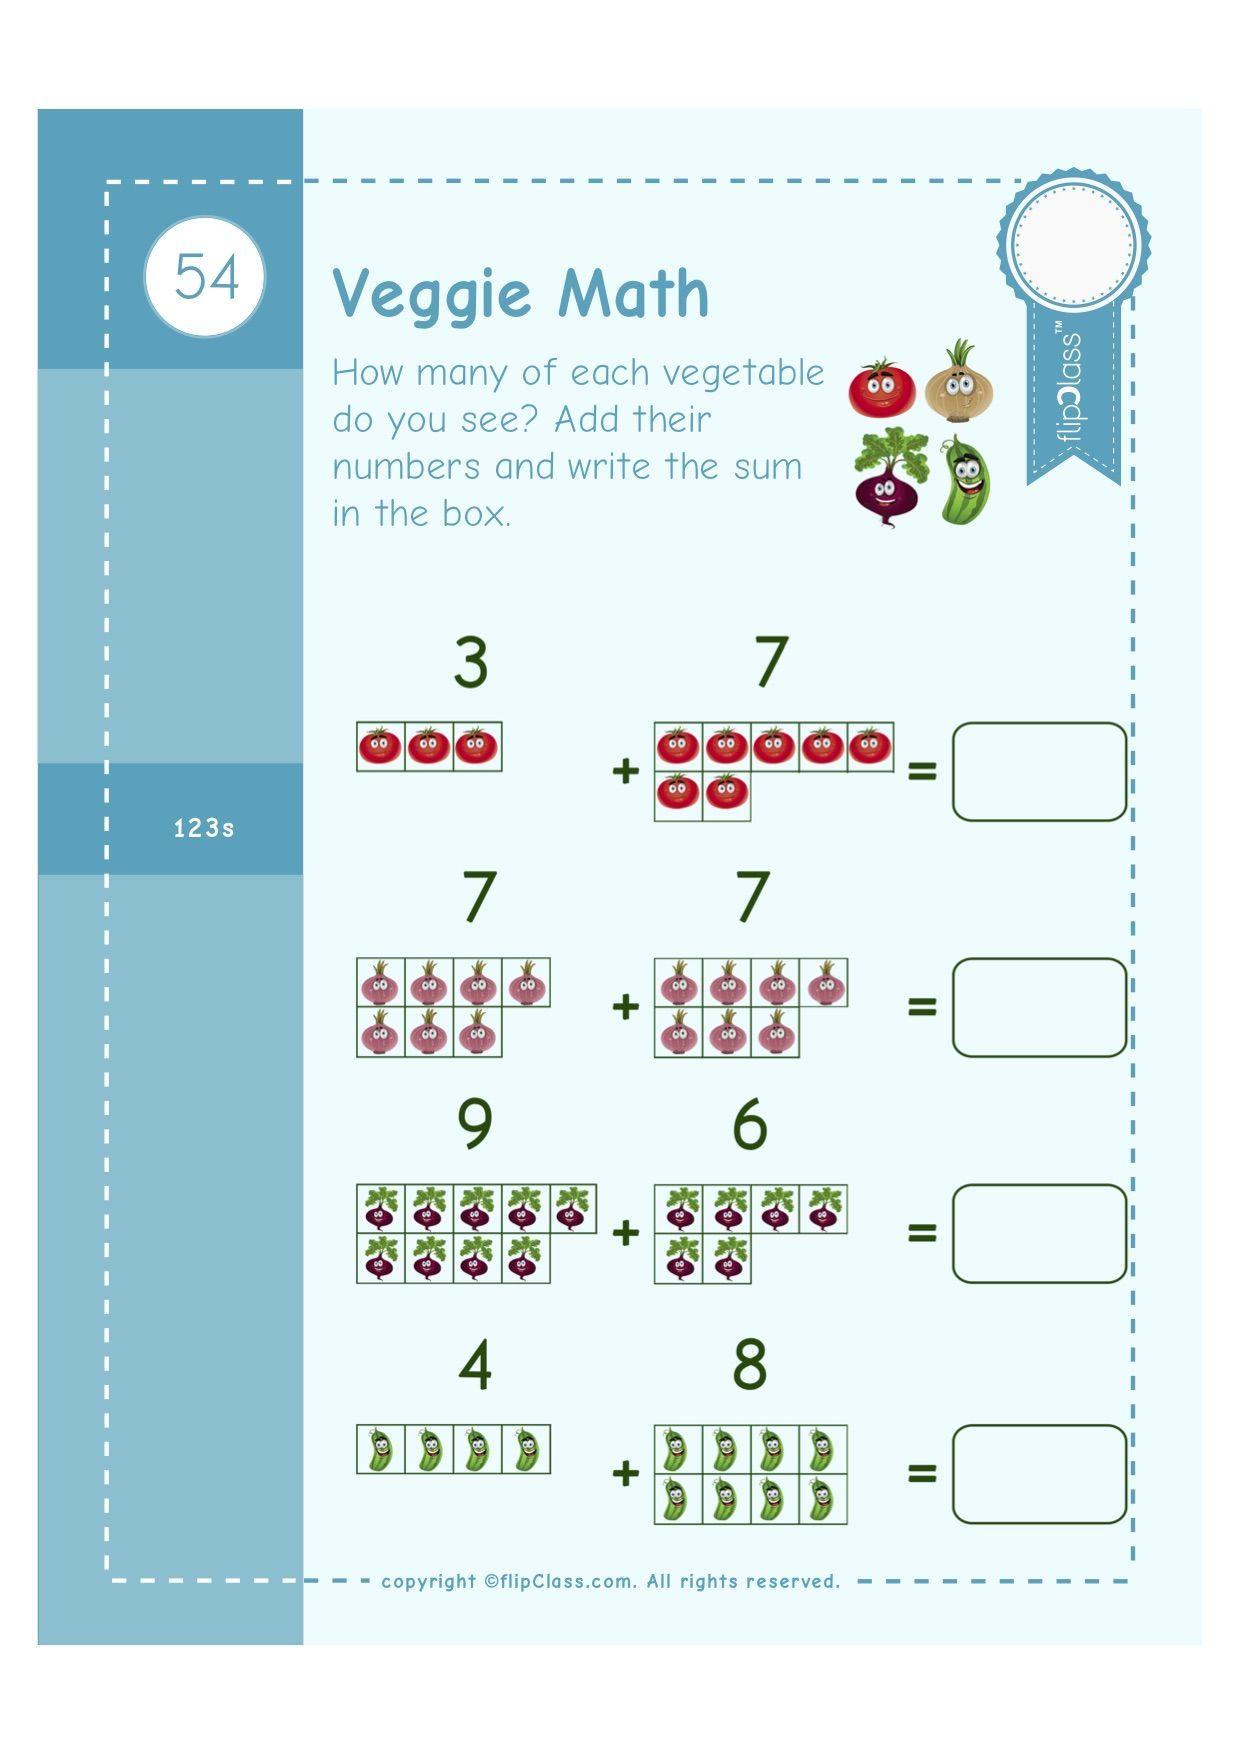 Lkg Worksheets Flipclass Genius Kids Workbooks These